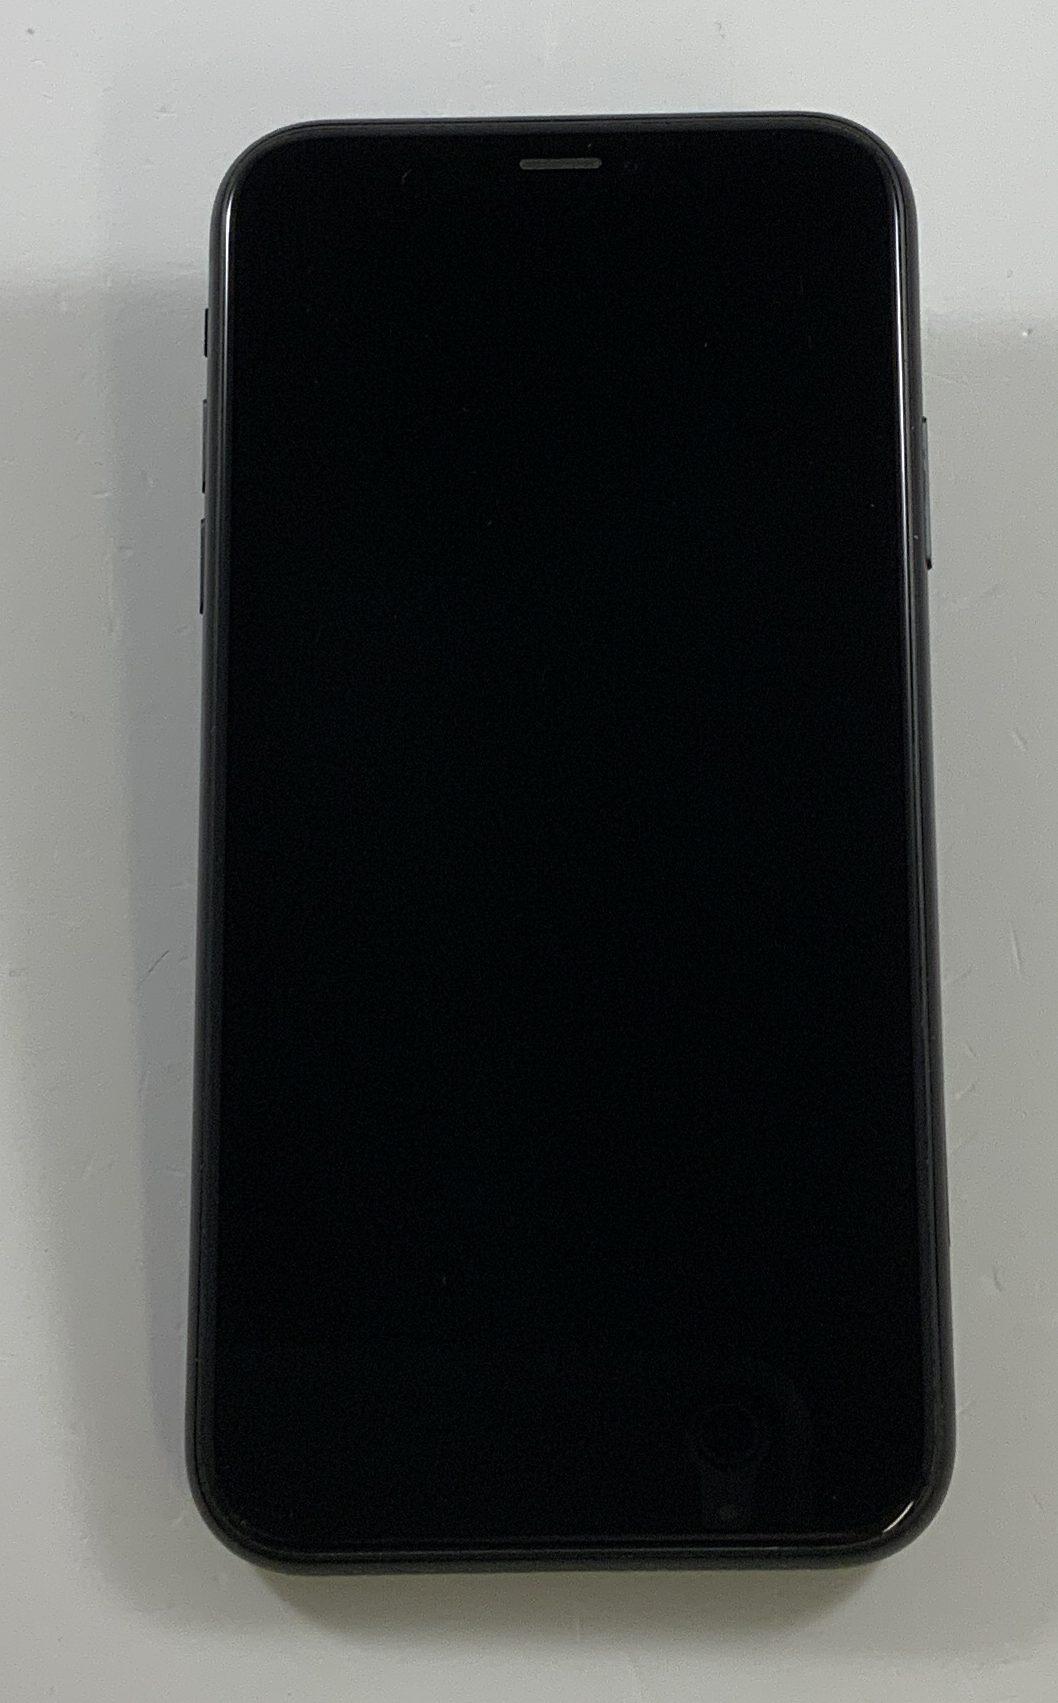 iPhone XR 64GB, 64GB, Black, image 1